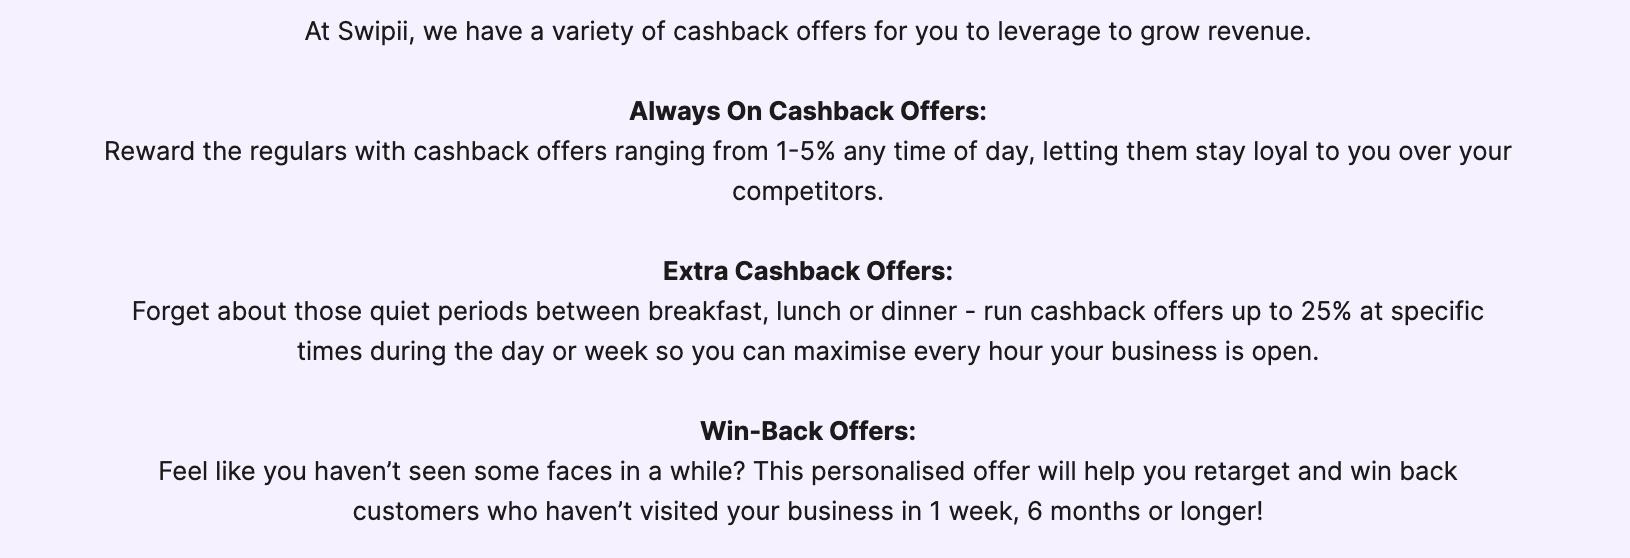 swipii-cashback-offer-types